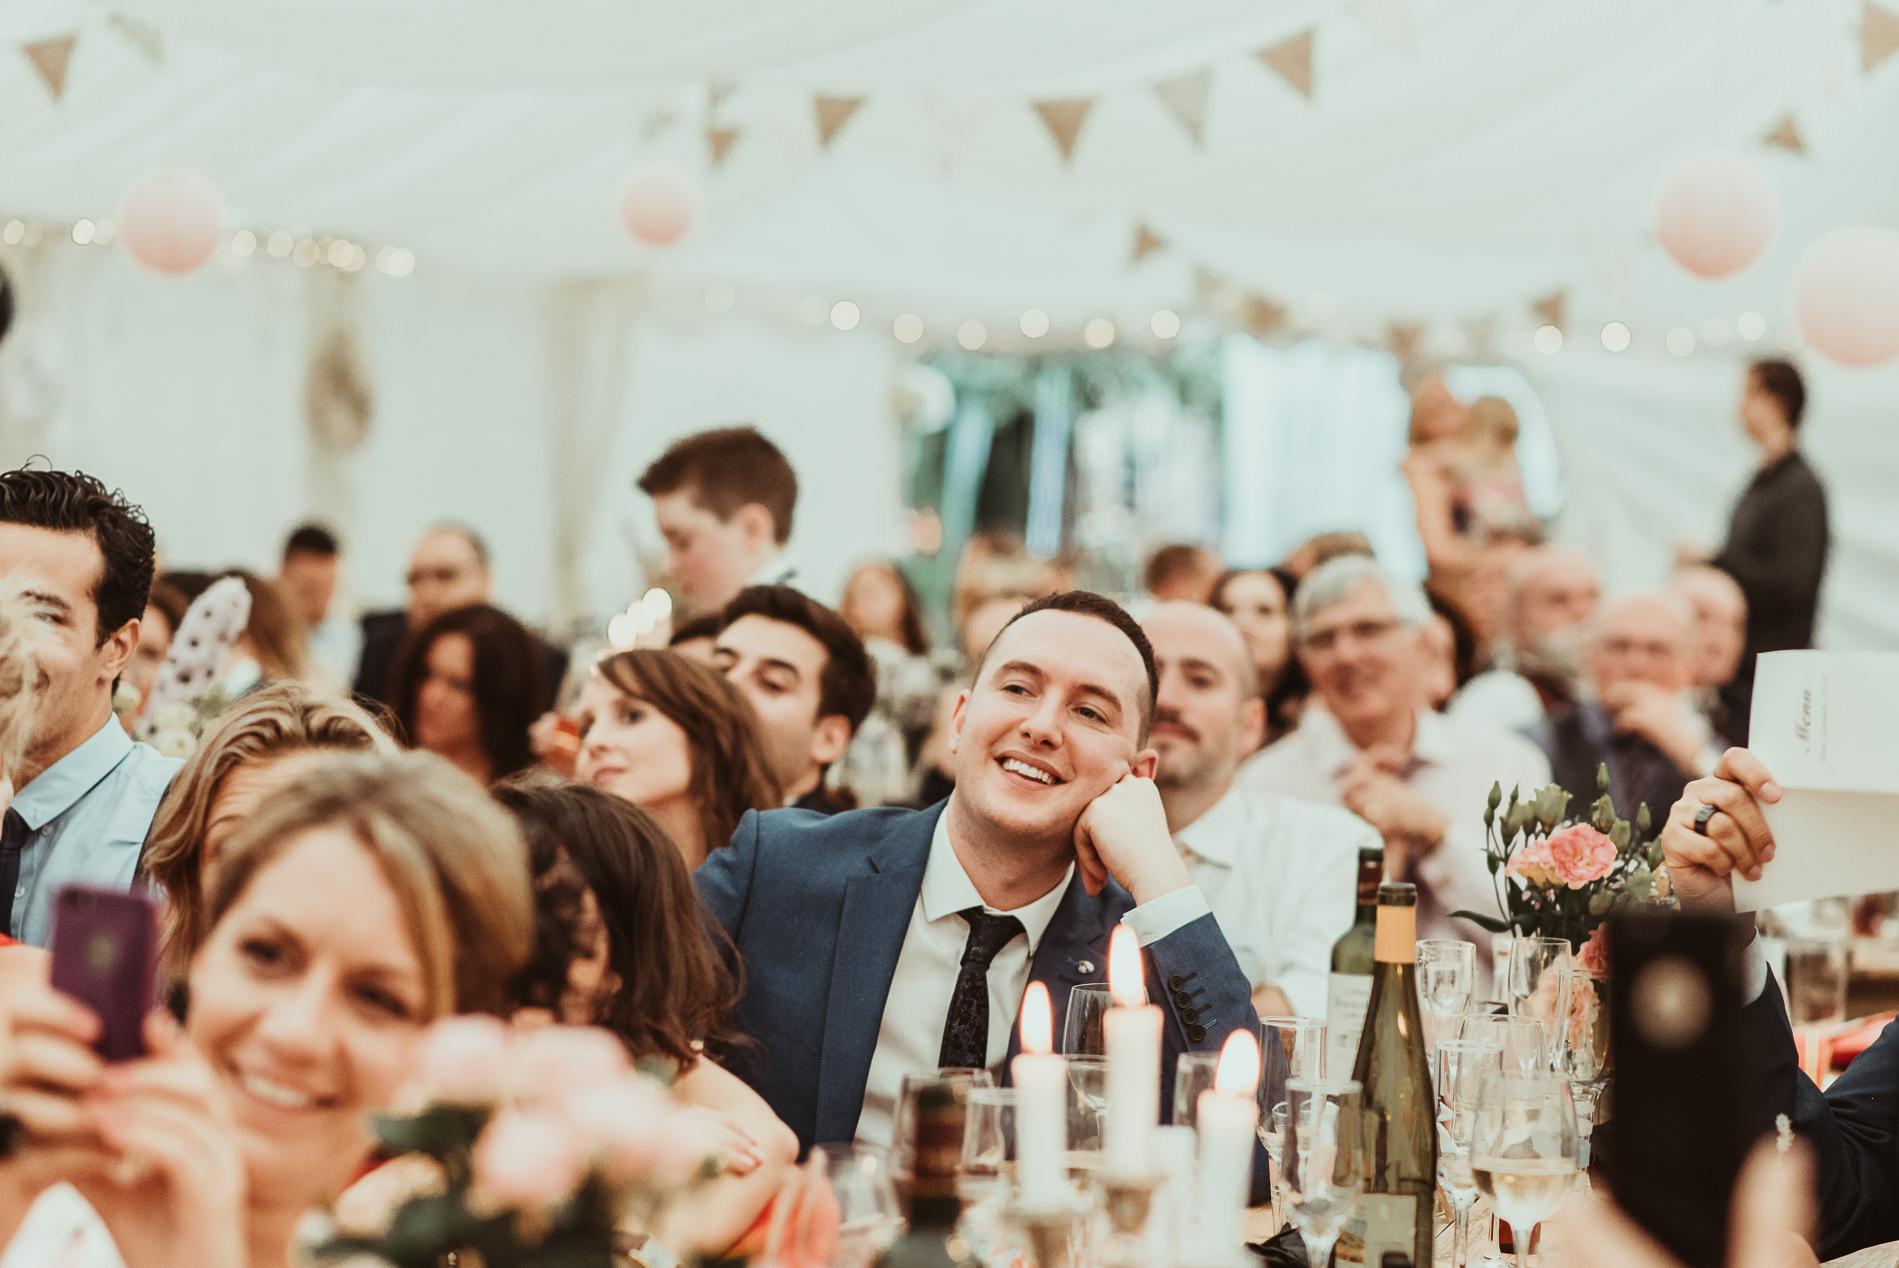 bohemian_wedding_lawshall_church_garden70